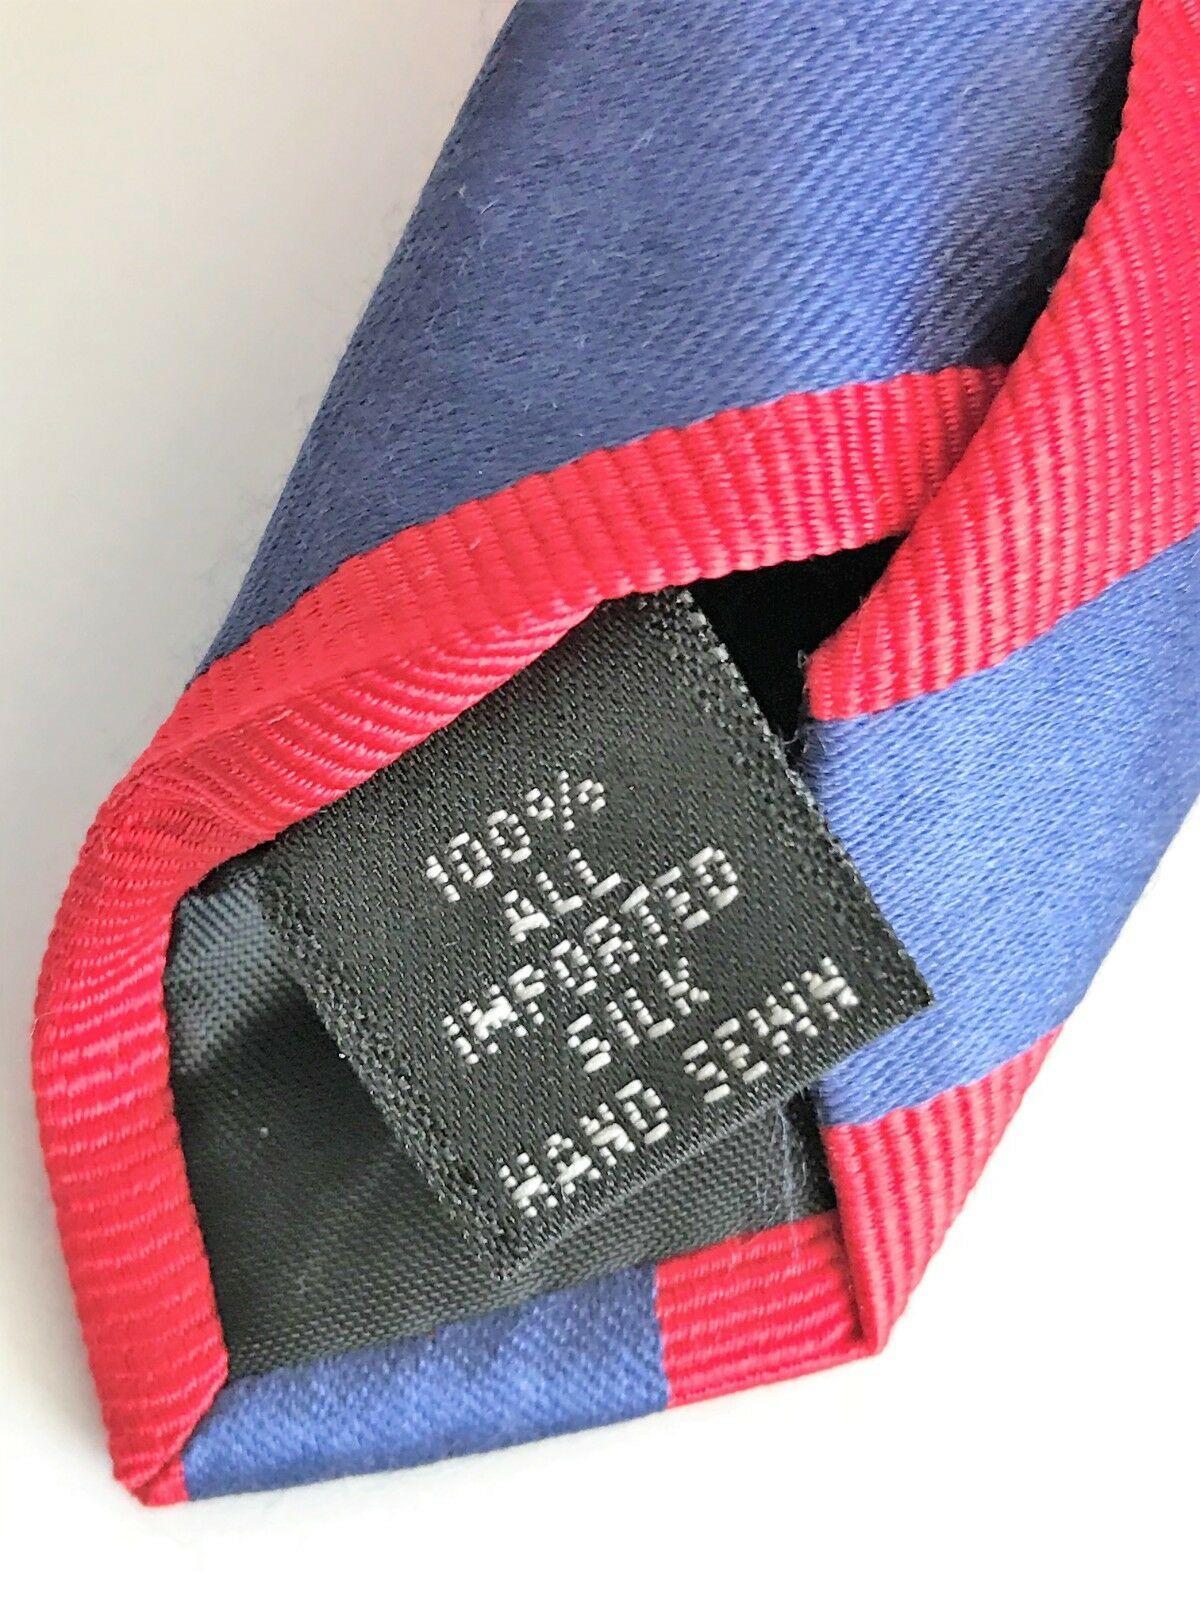 Kenneth Cole Reaction Men's Striped Blue & Red Silk Necktie image 6